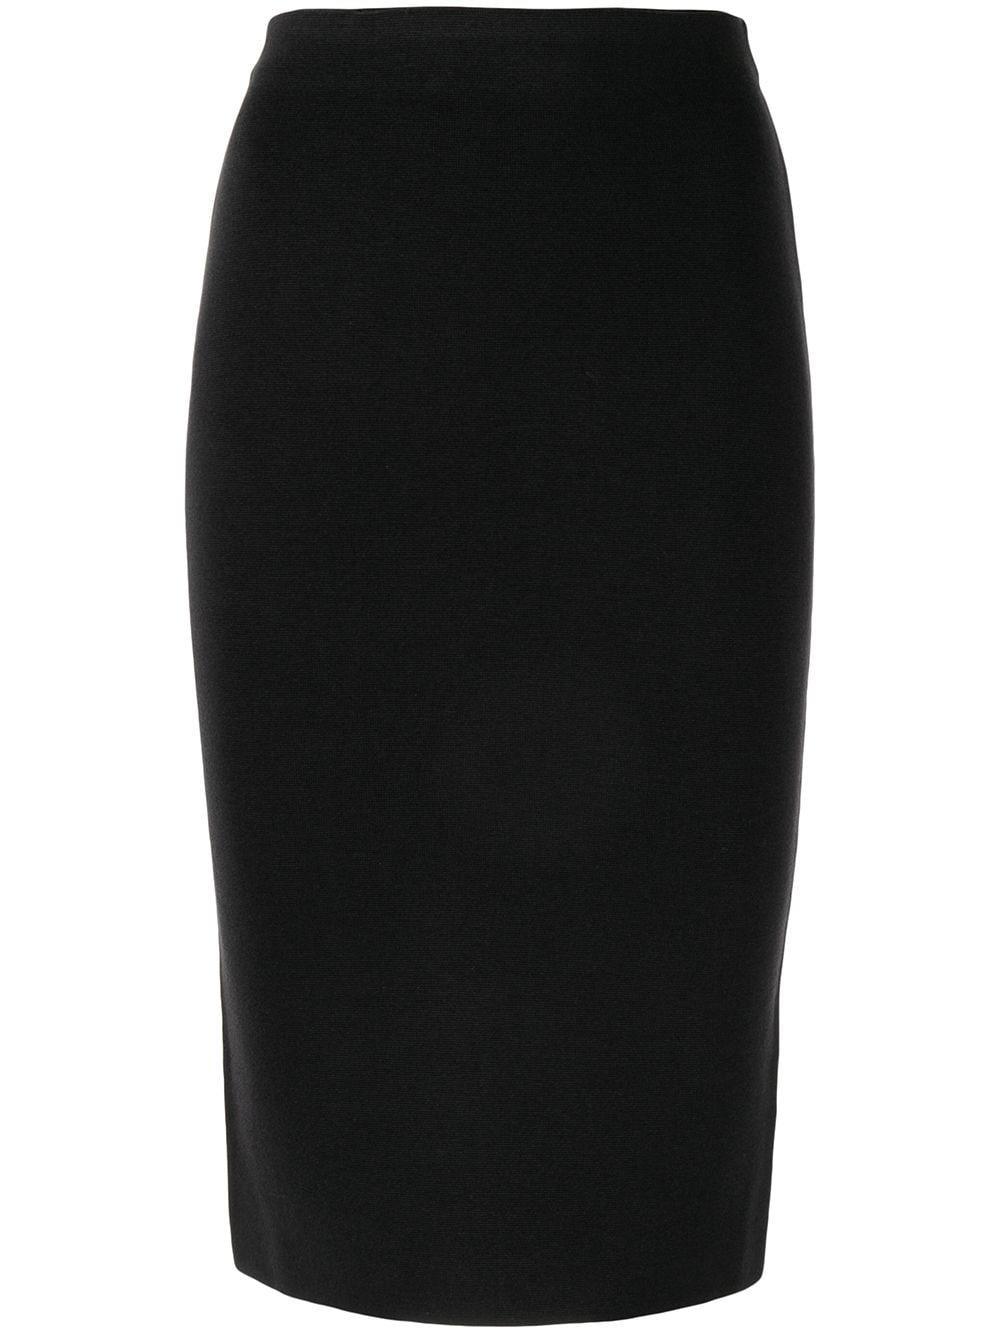 Shanghai Tang трикотажная юбка-карандаш с эластичным поясом